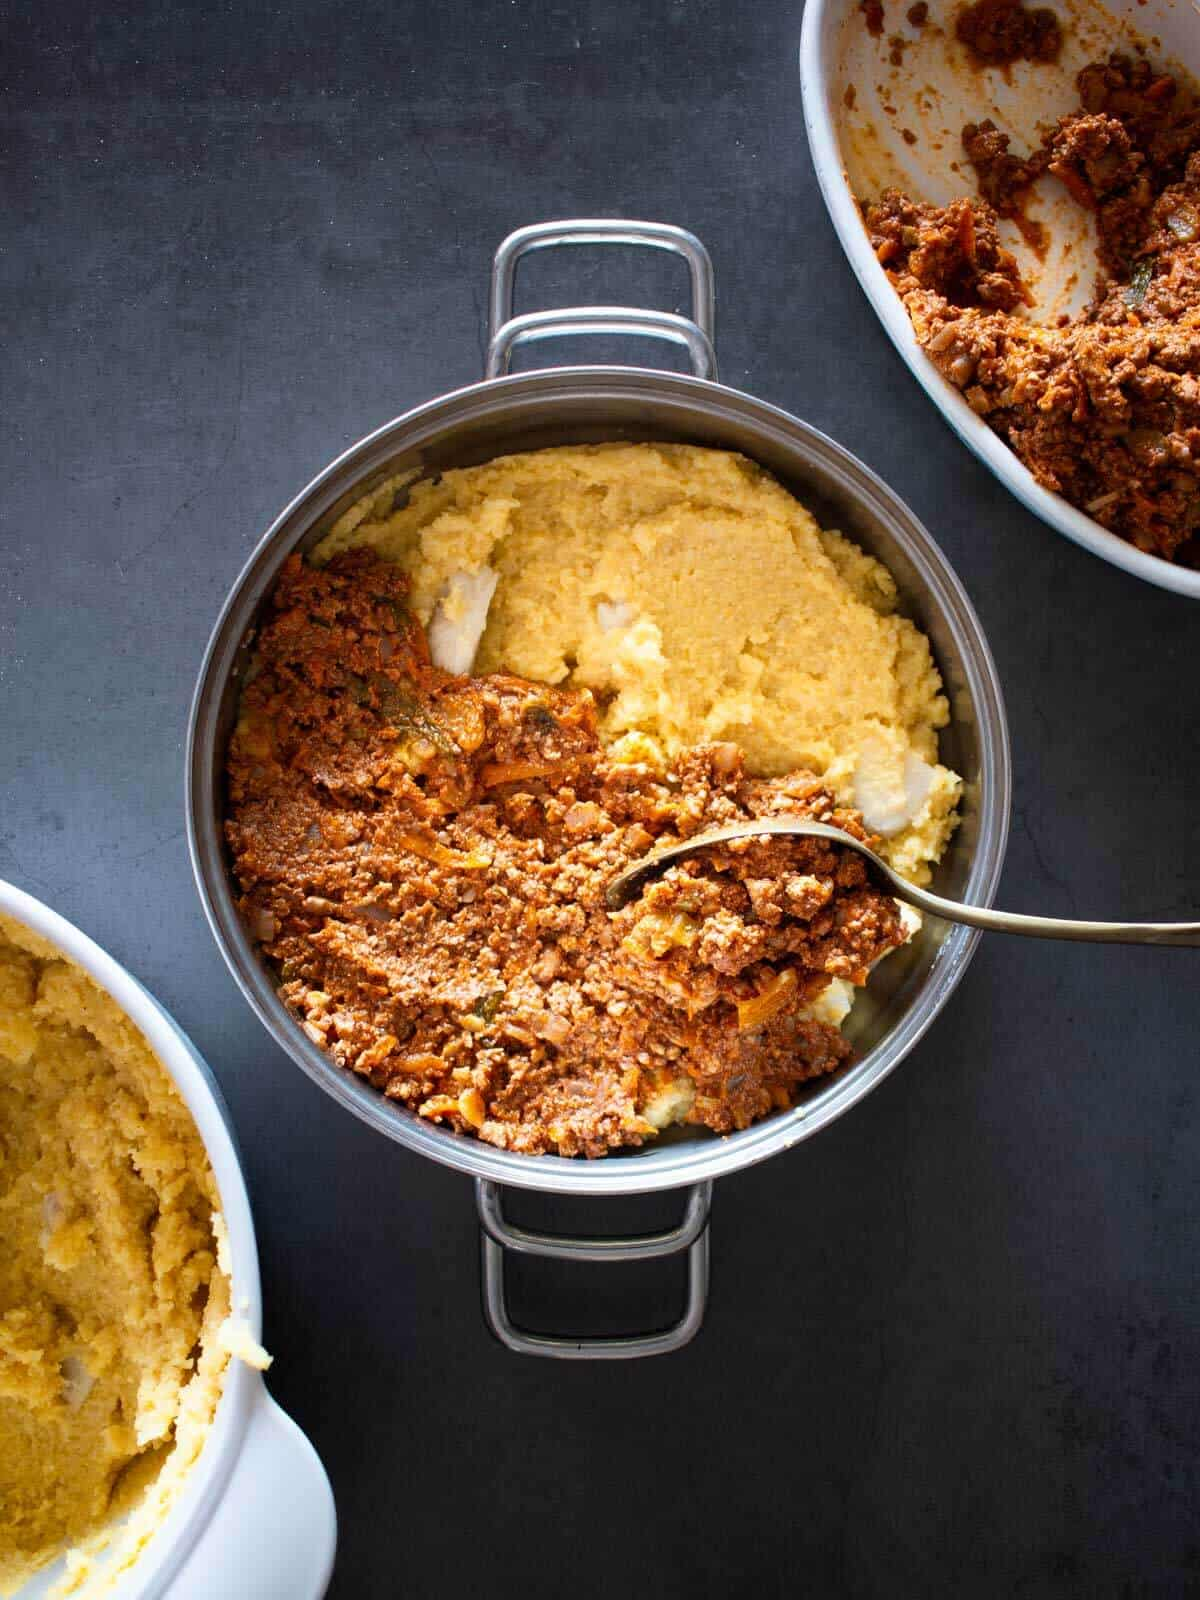 Vegan Baked Polenta Recipe with Vegetable Bolognese